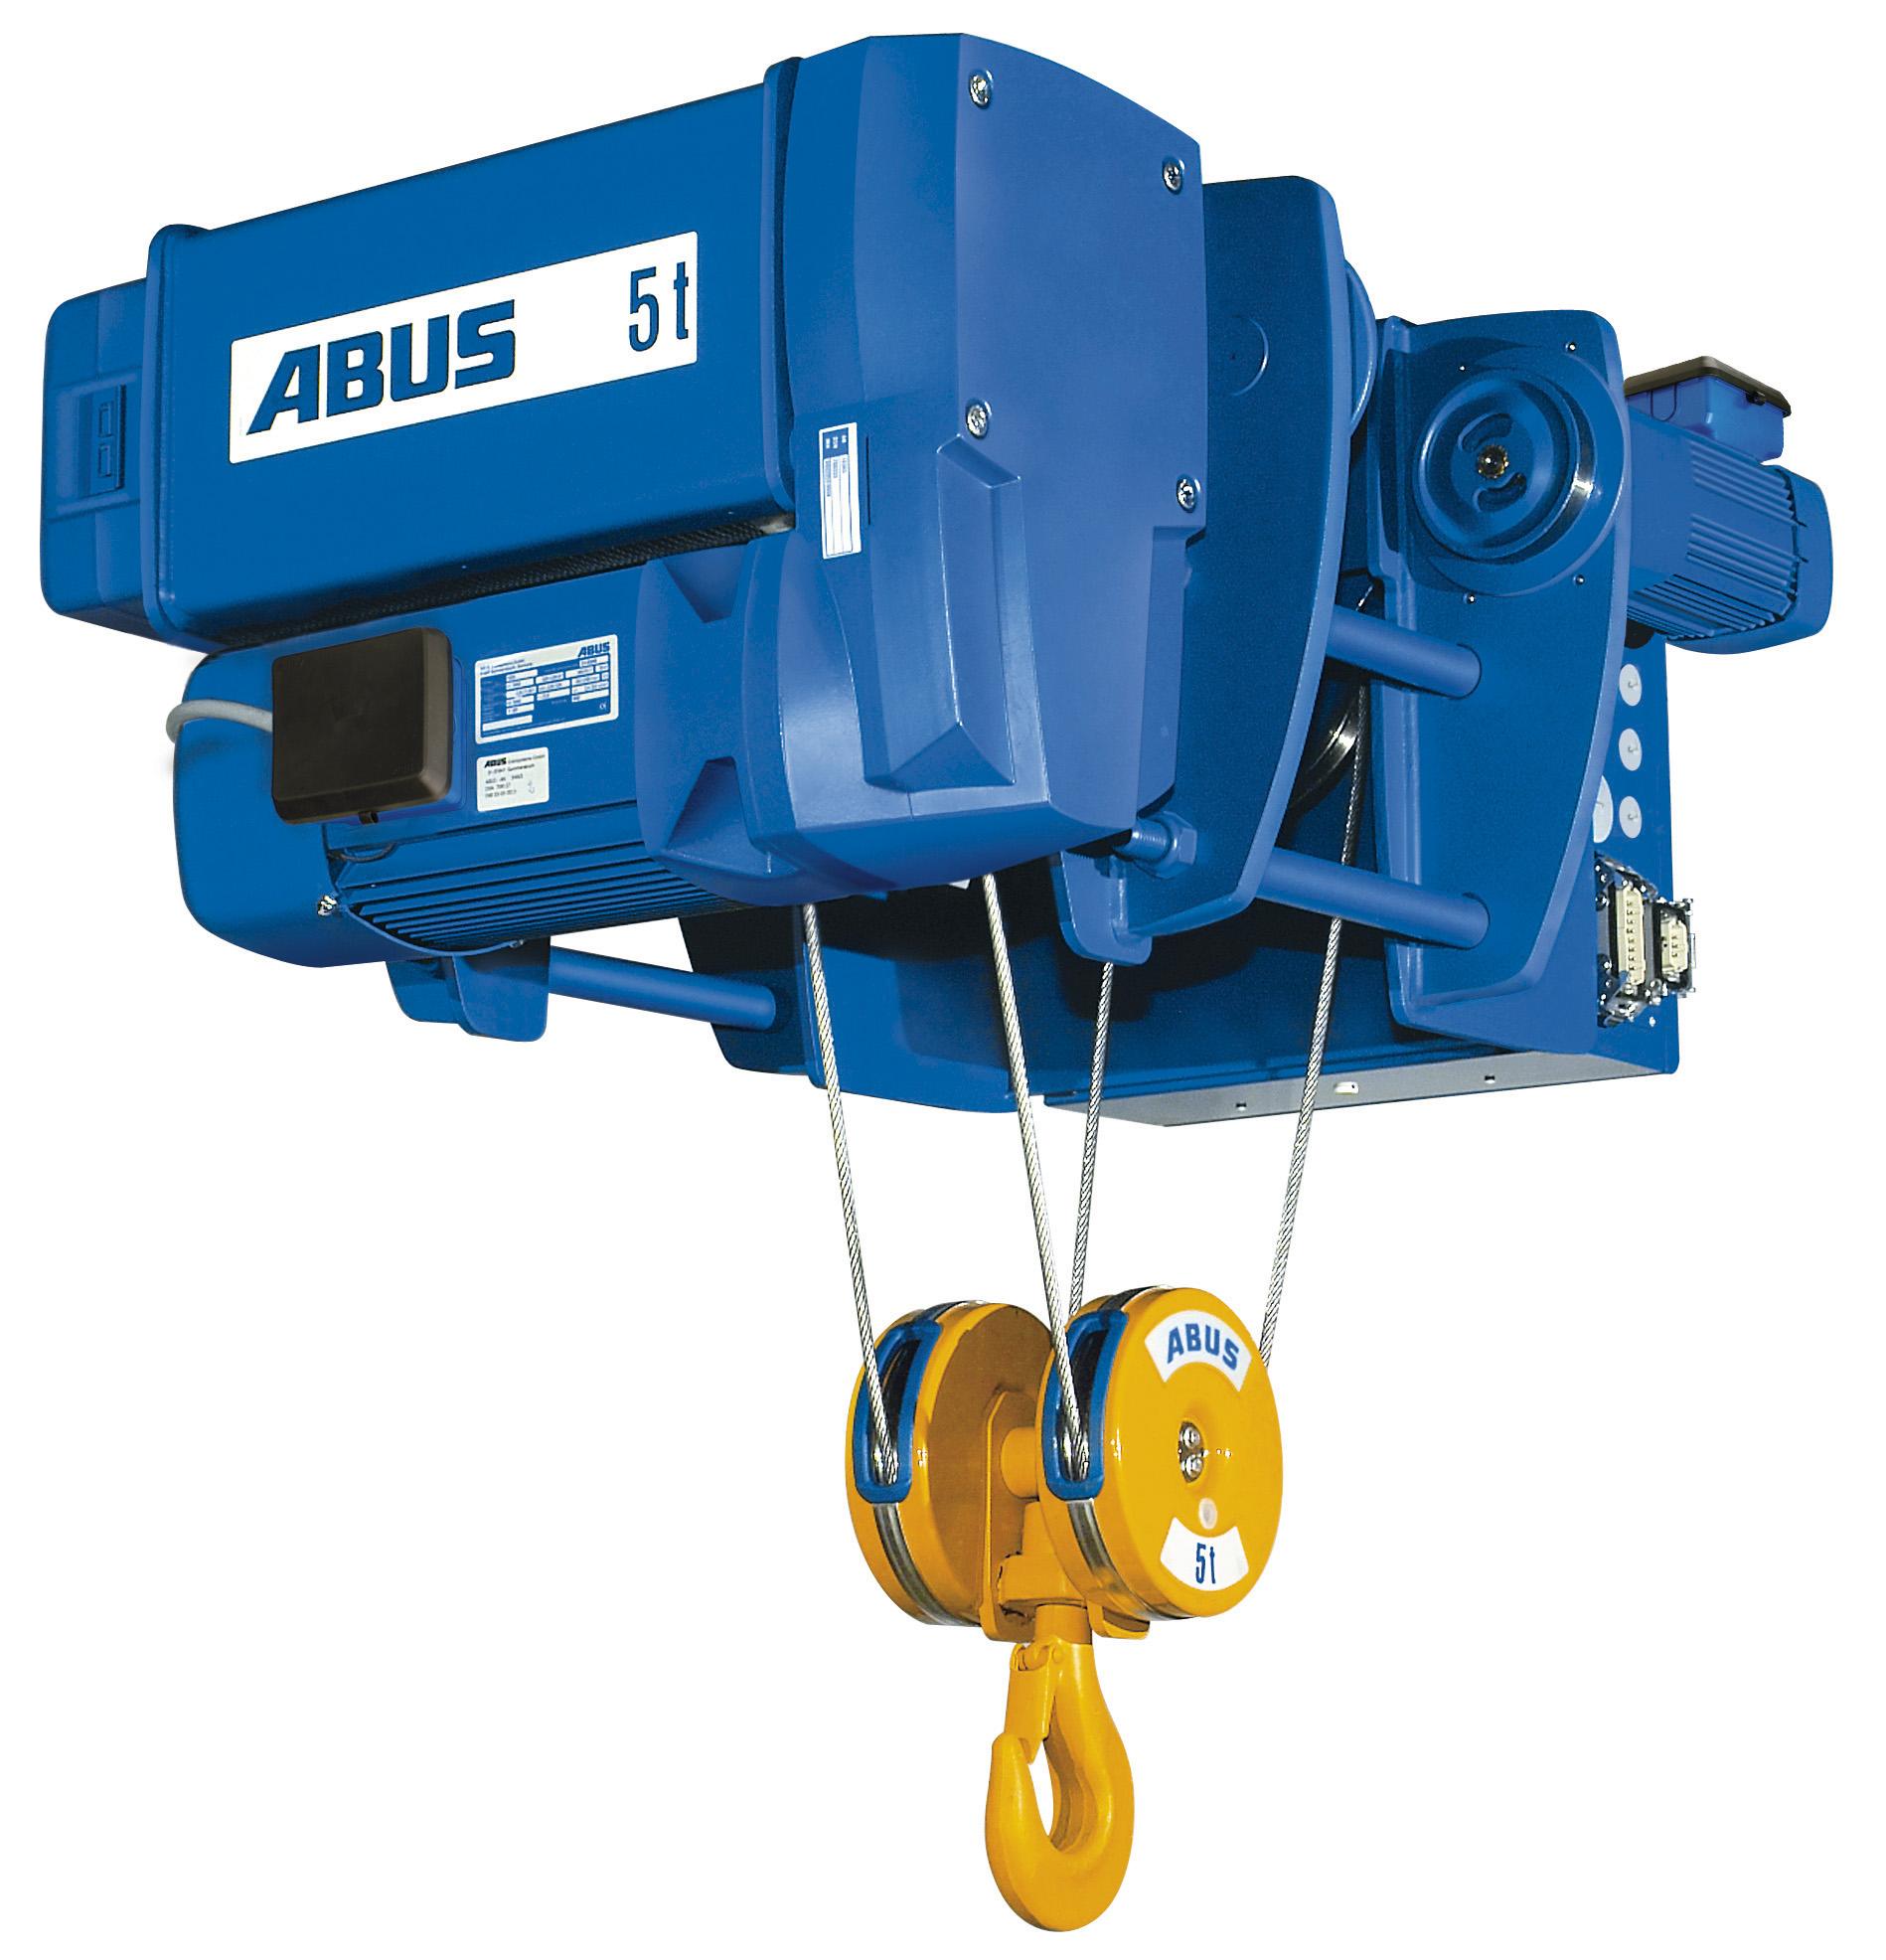 ABUS Elektro-Seilzüge